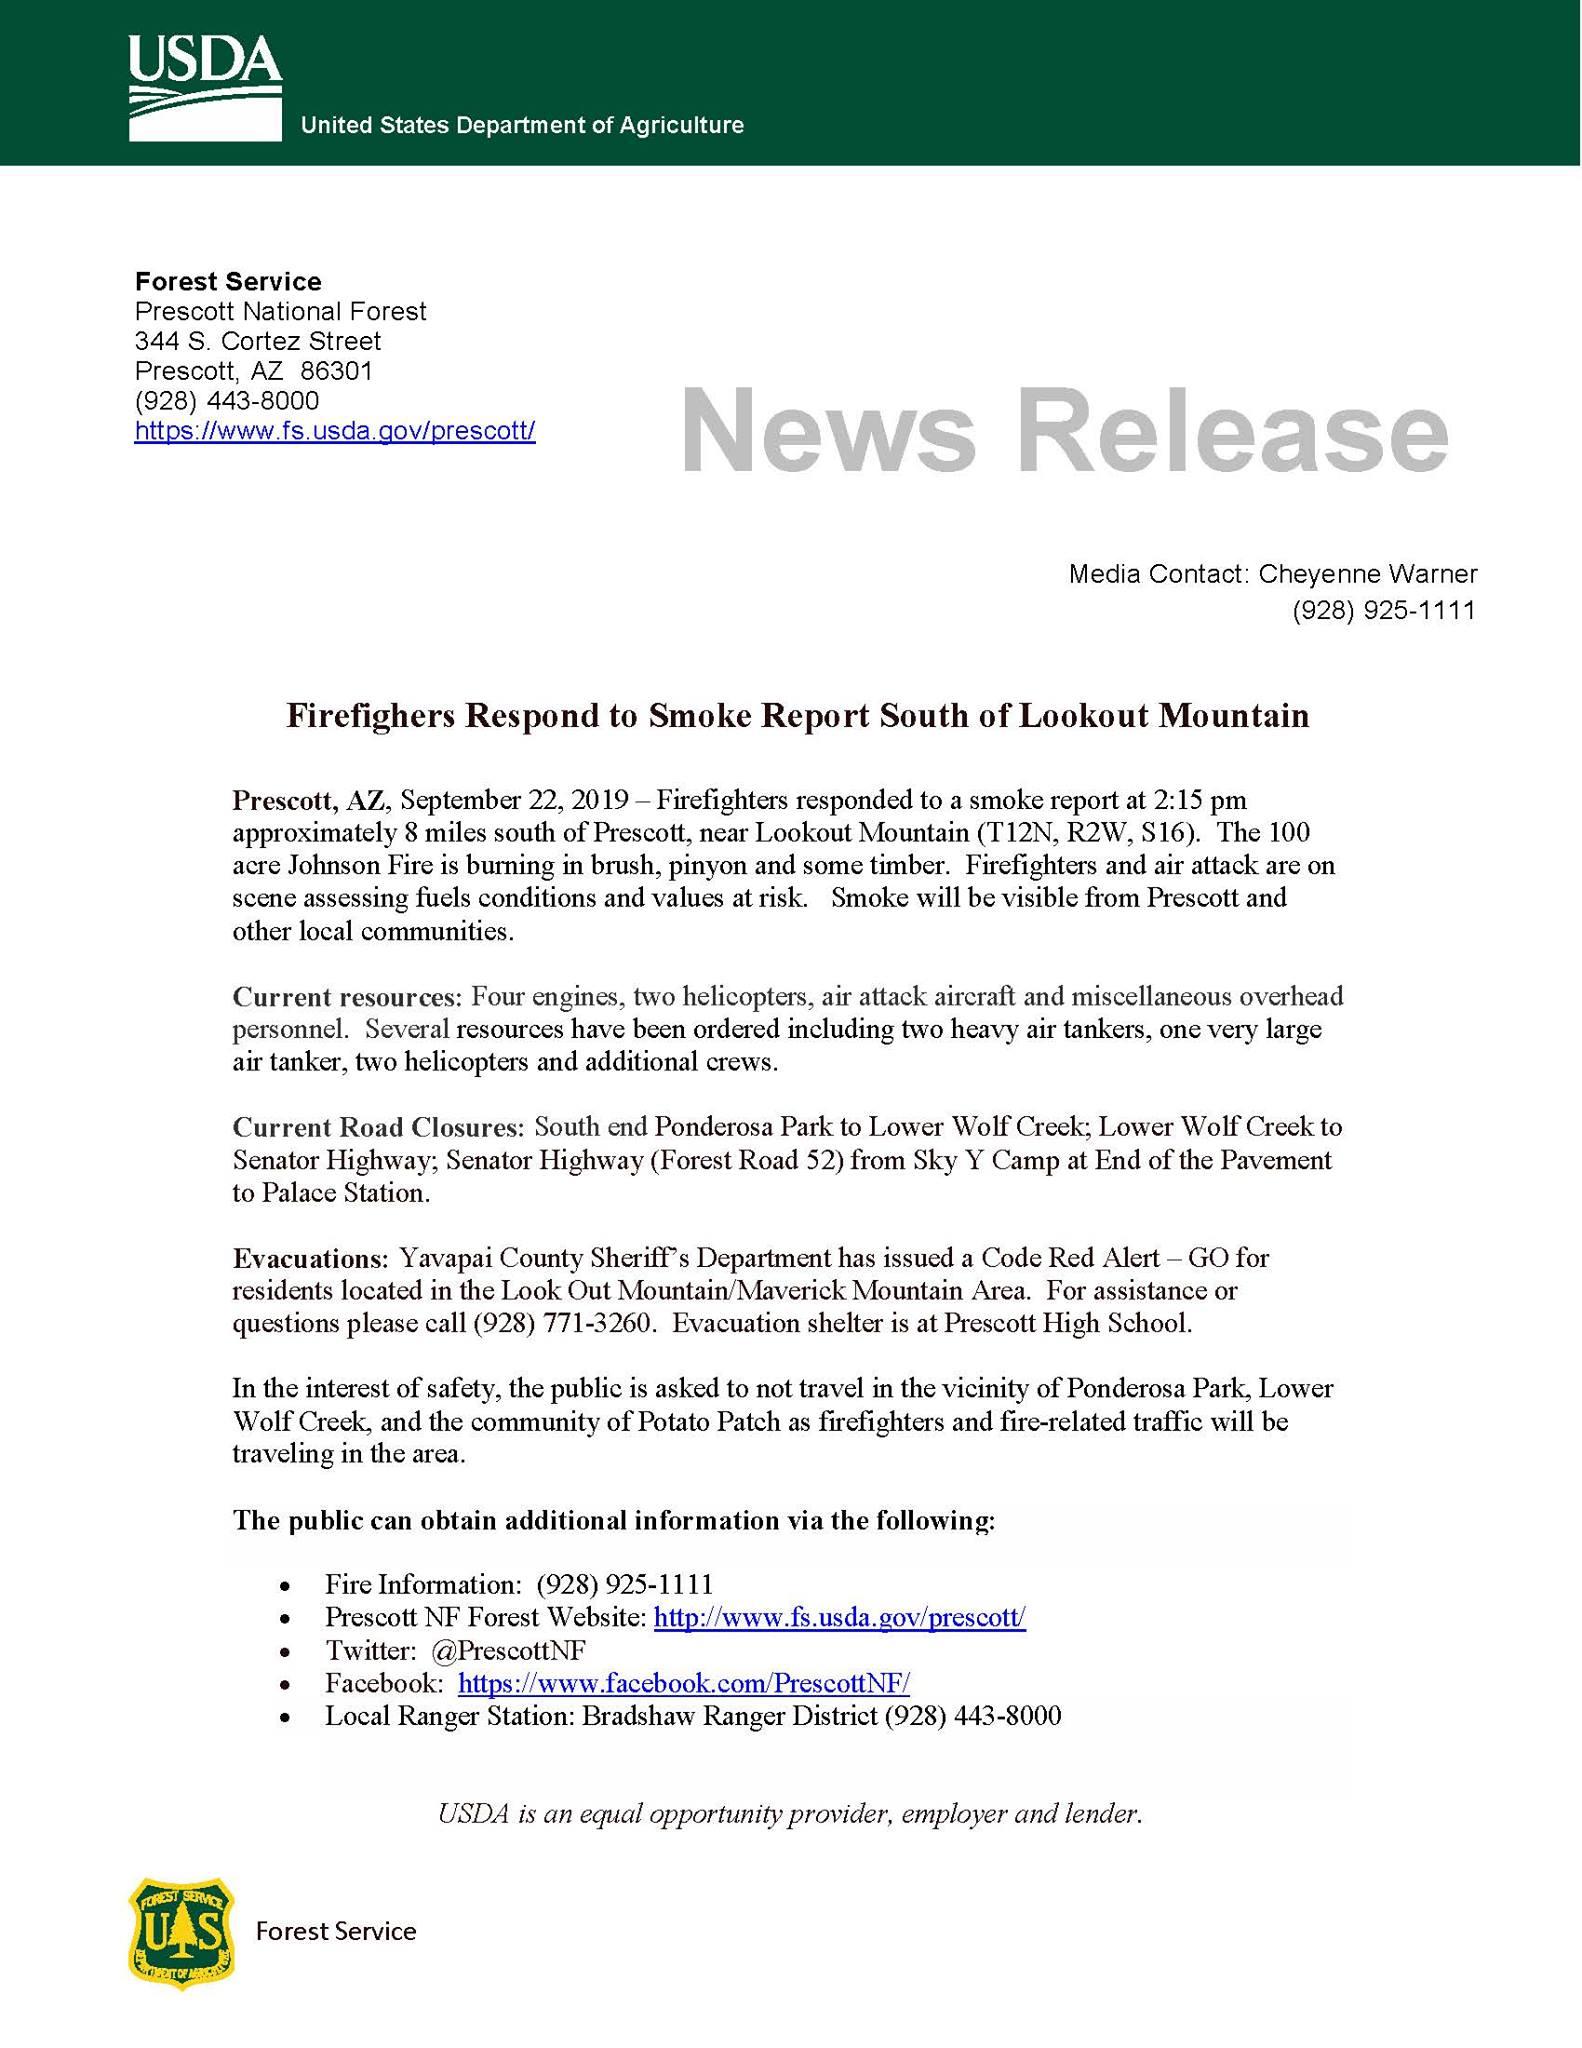 Johnson Fire Press Release